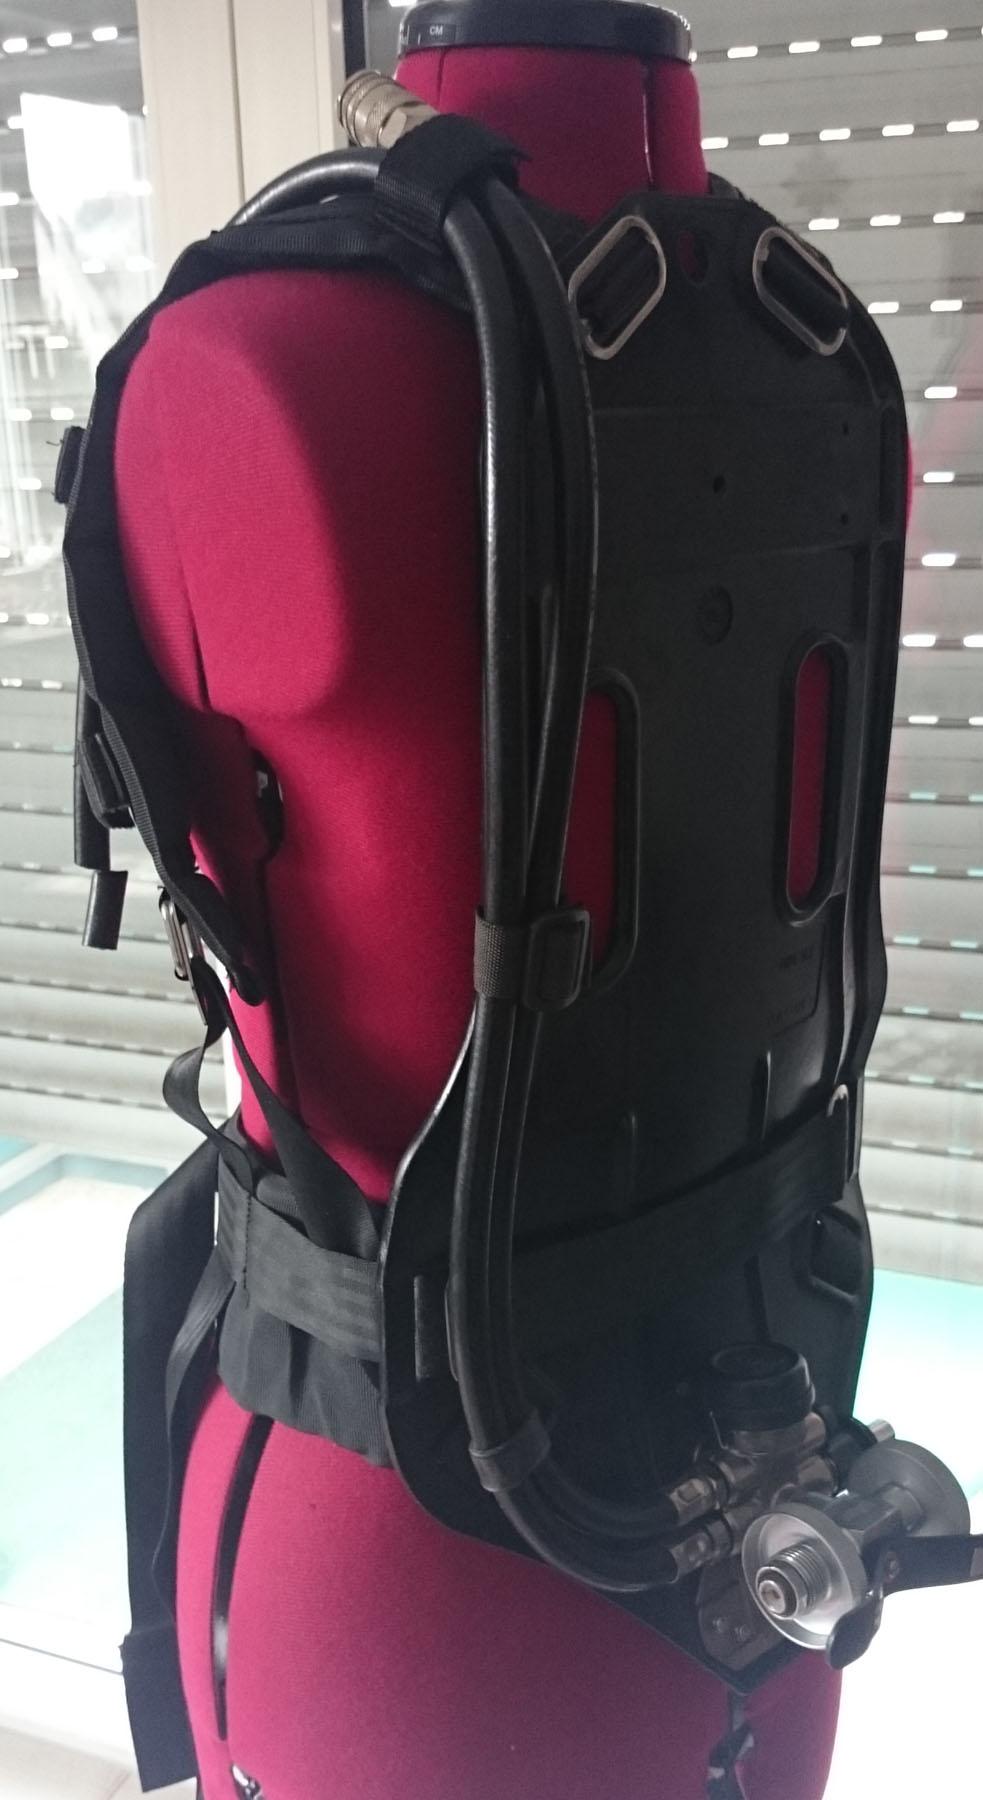 Flügel-Grundplatte, Rückenansicht